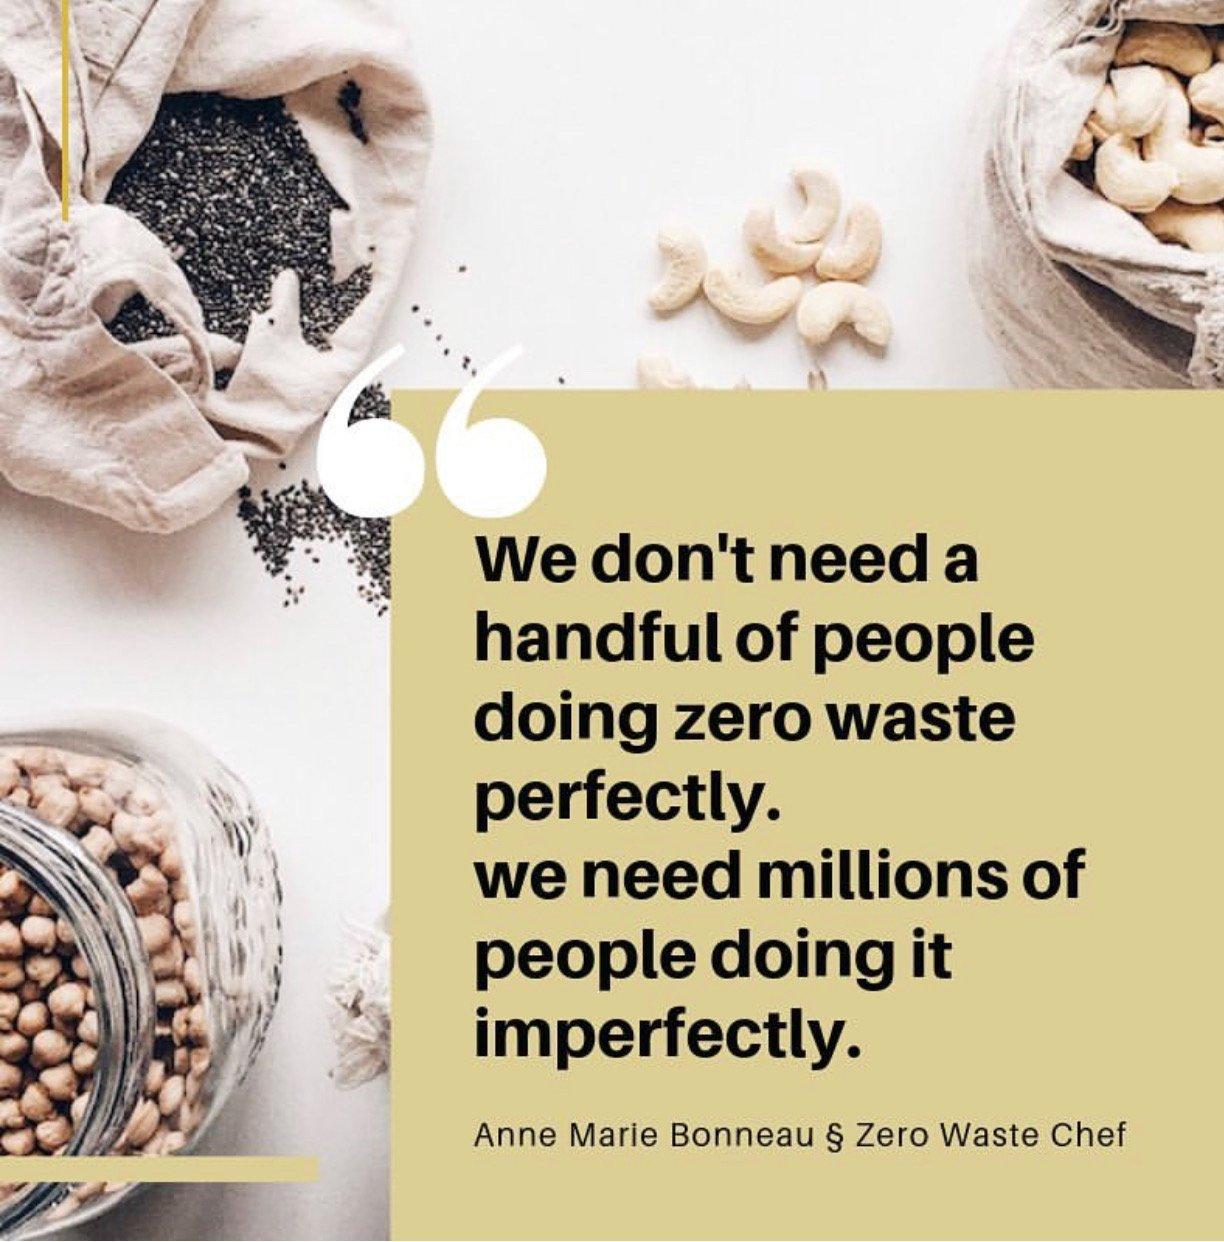 "😷 Anne-Marie Bonneau 😷 en Twitter: ""We don't need a handful of people  doing zero waste perfectly. We need millions of people doing it  imperfectly. https://t.co/MYywqmLbtb pic @happymindmag meme:  https://t.co/gsojDd9fd4… https://t.co/3I175jx2jE"""